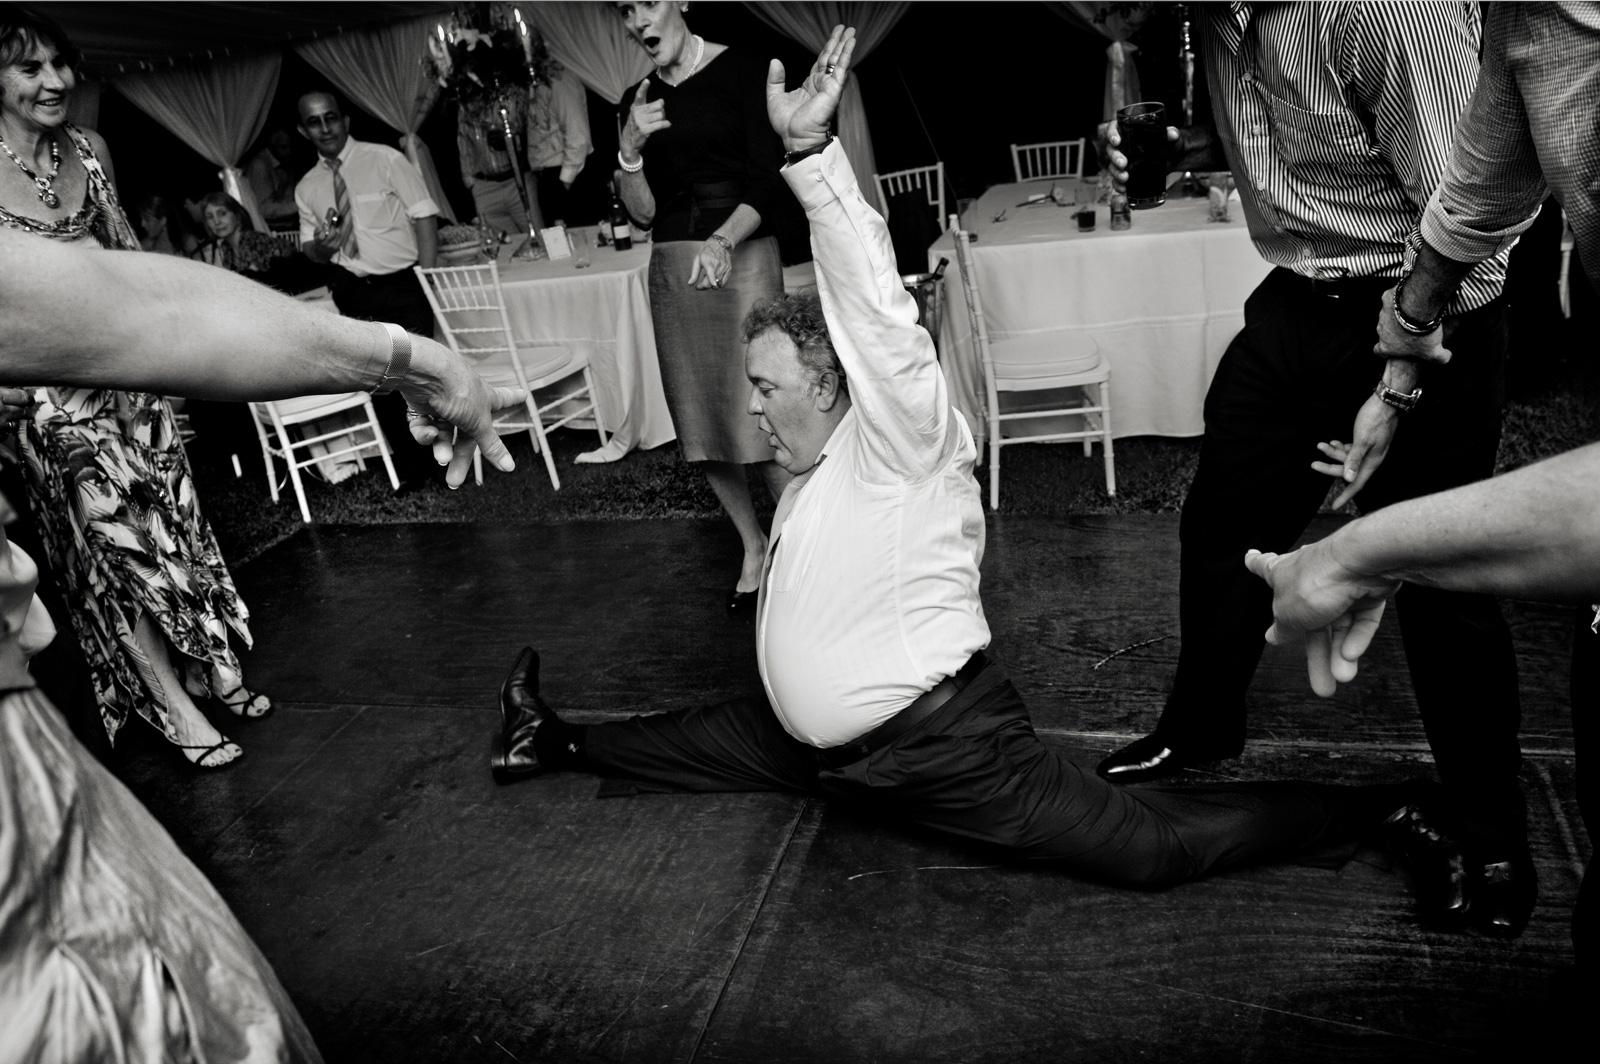 Dancing-Jacki-Bruniquel-Hoorah009